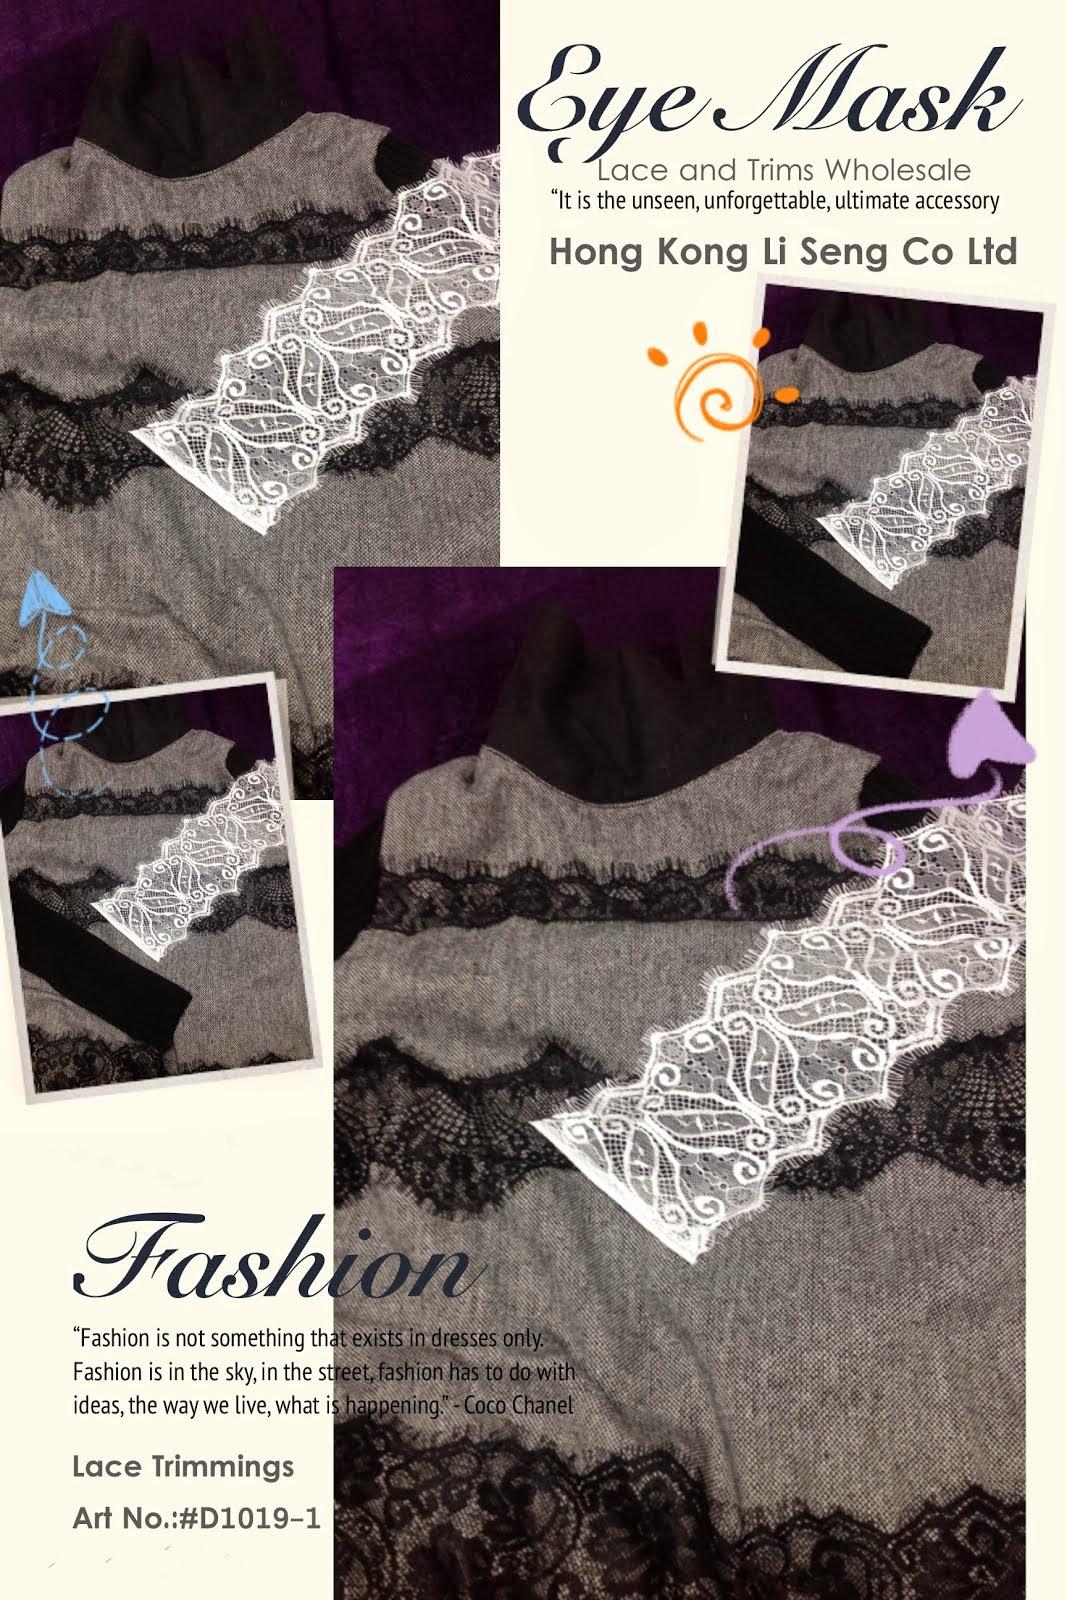 Eyelash Lace Trims Supplier Wholesale Manufacturer - Hong Kong Li Seng Co Ltd